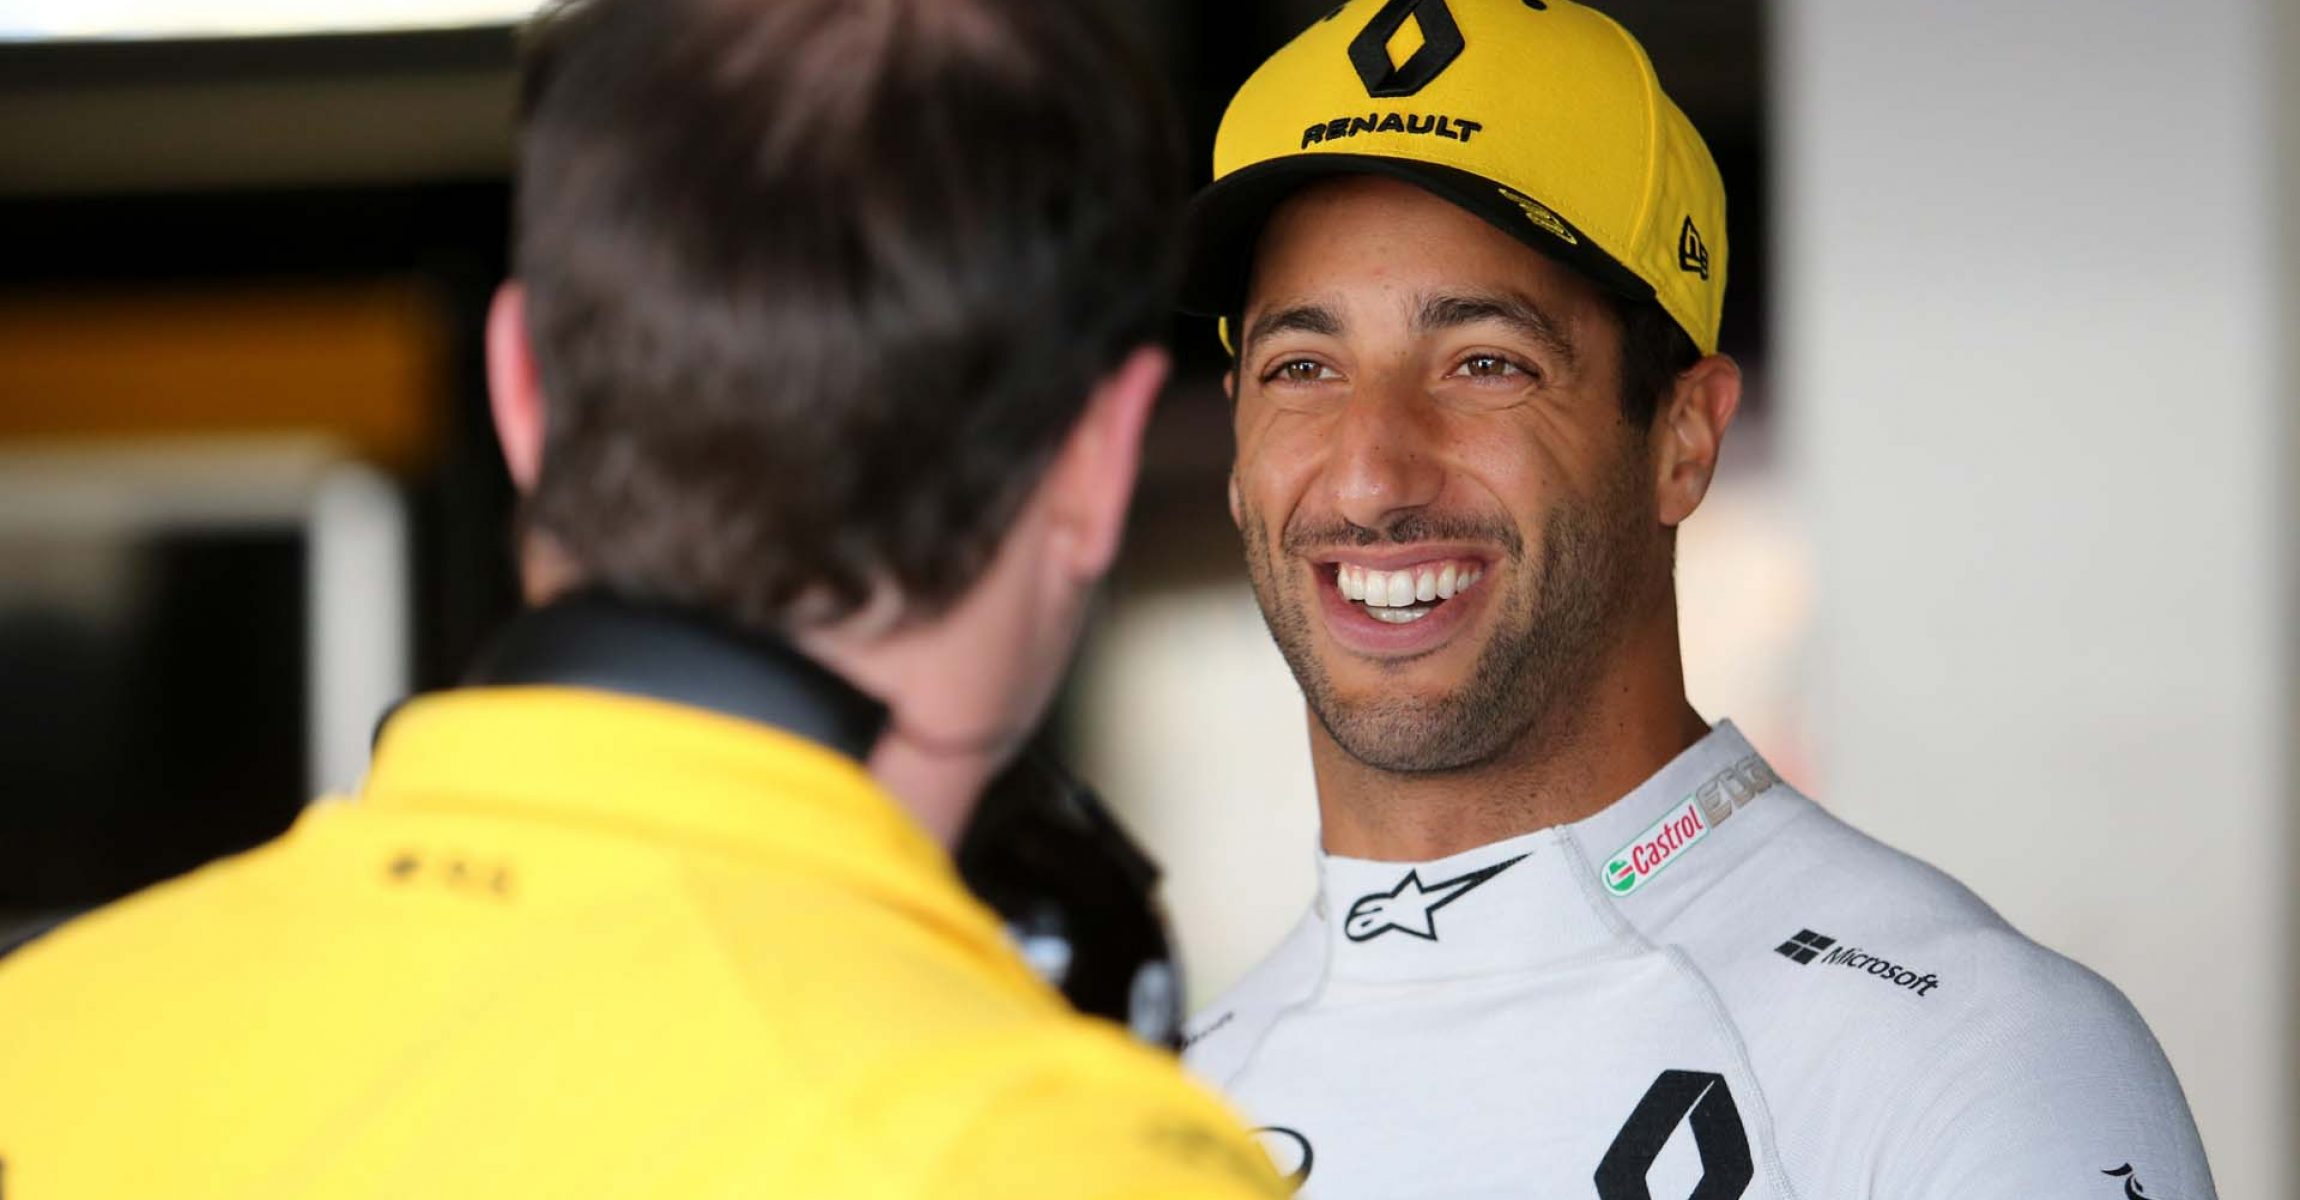 Daniel Ricciardo (AUS) Renault F1 Team. German Grand Prix, Friday 26th July 2019. Hockenheim, Germany.